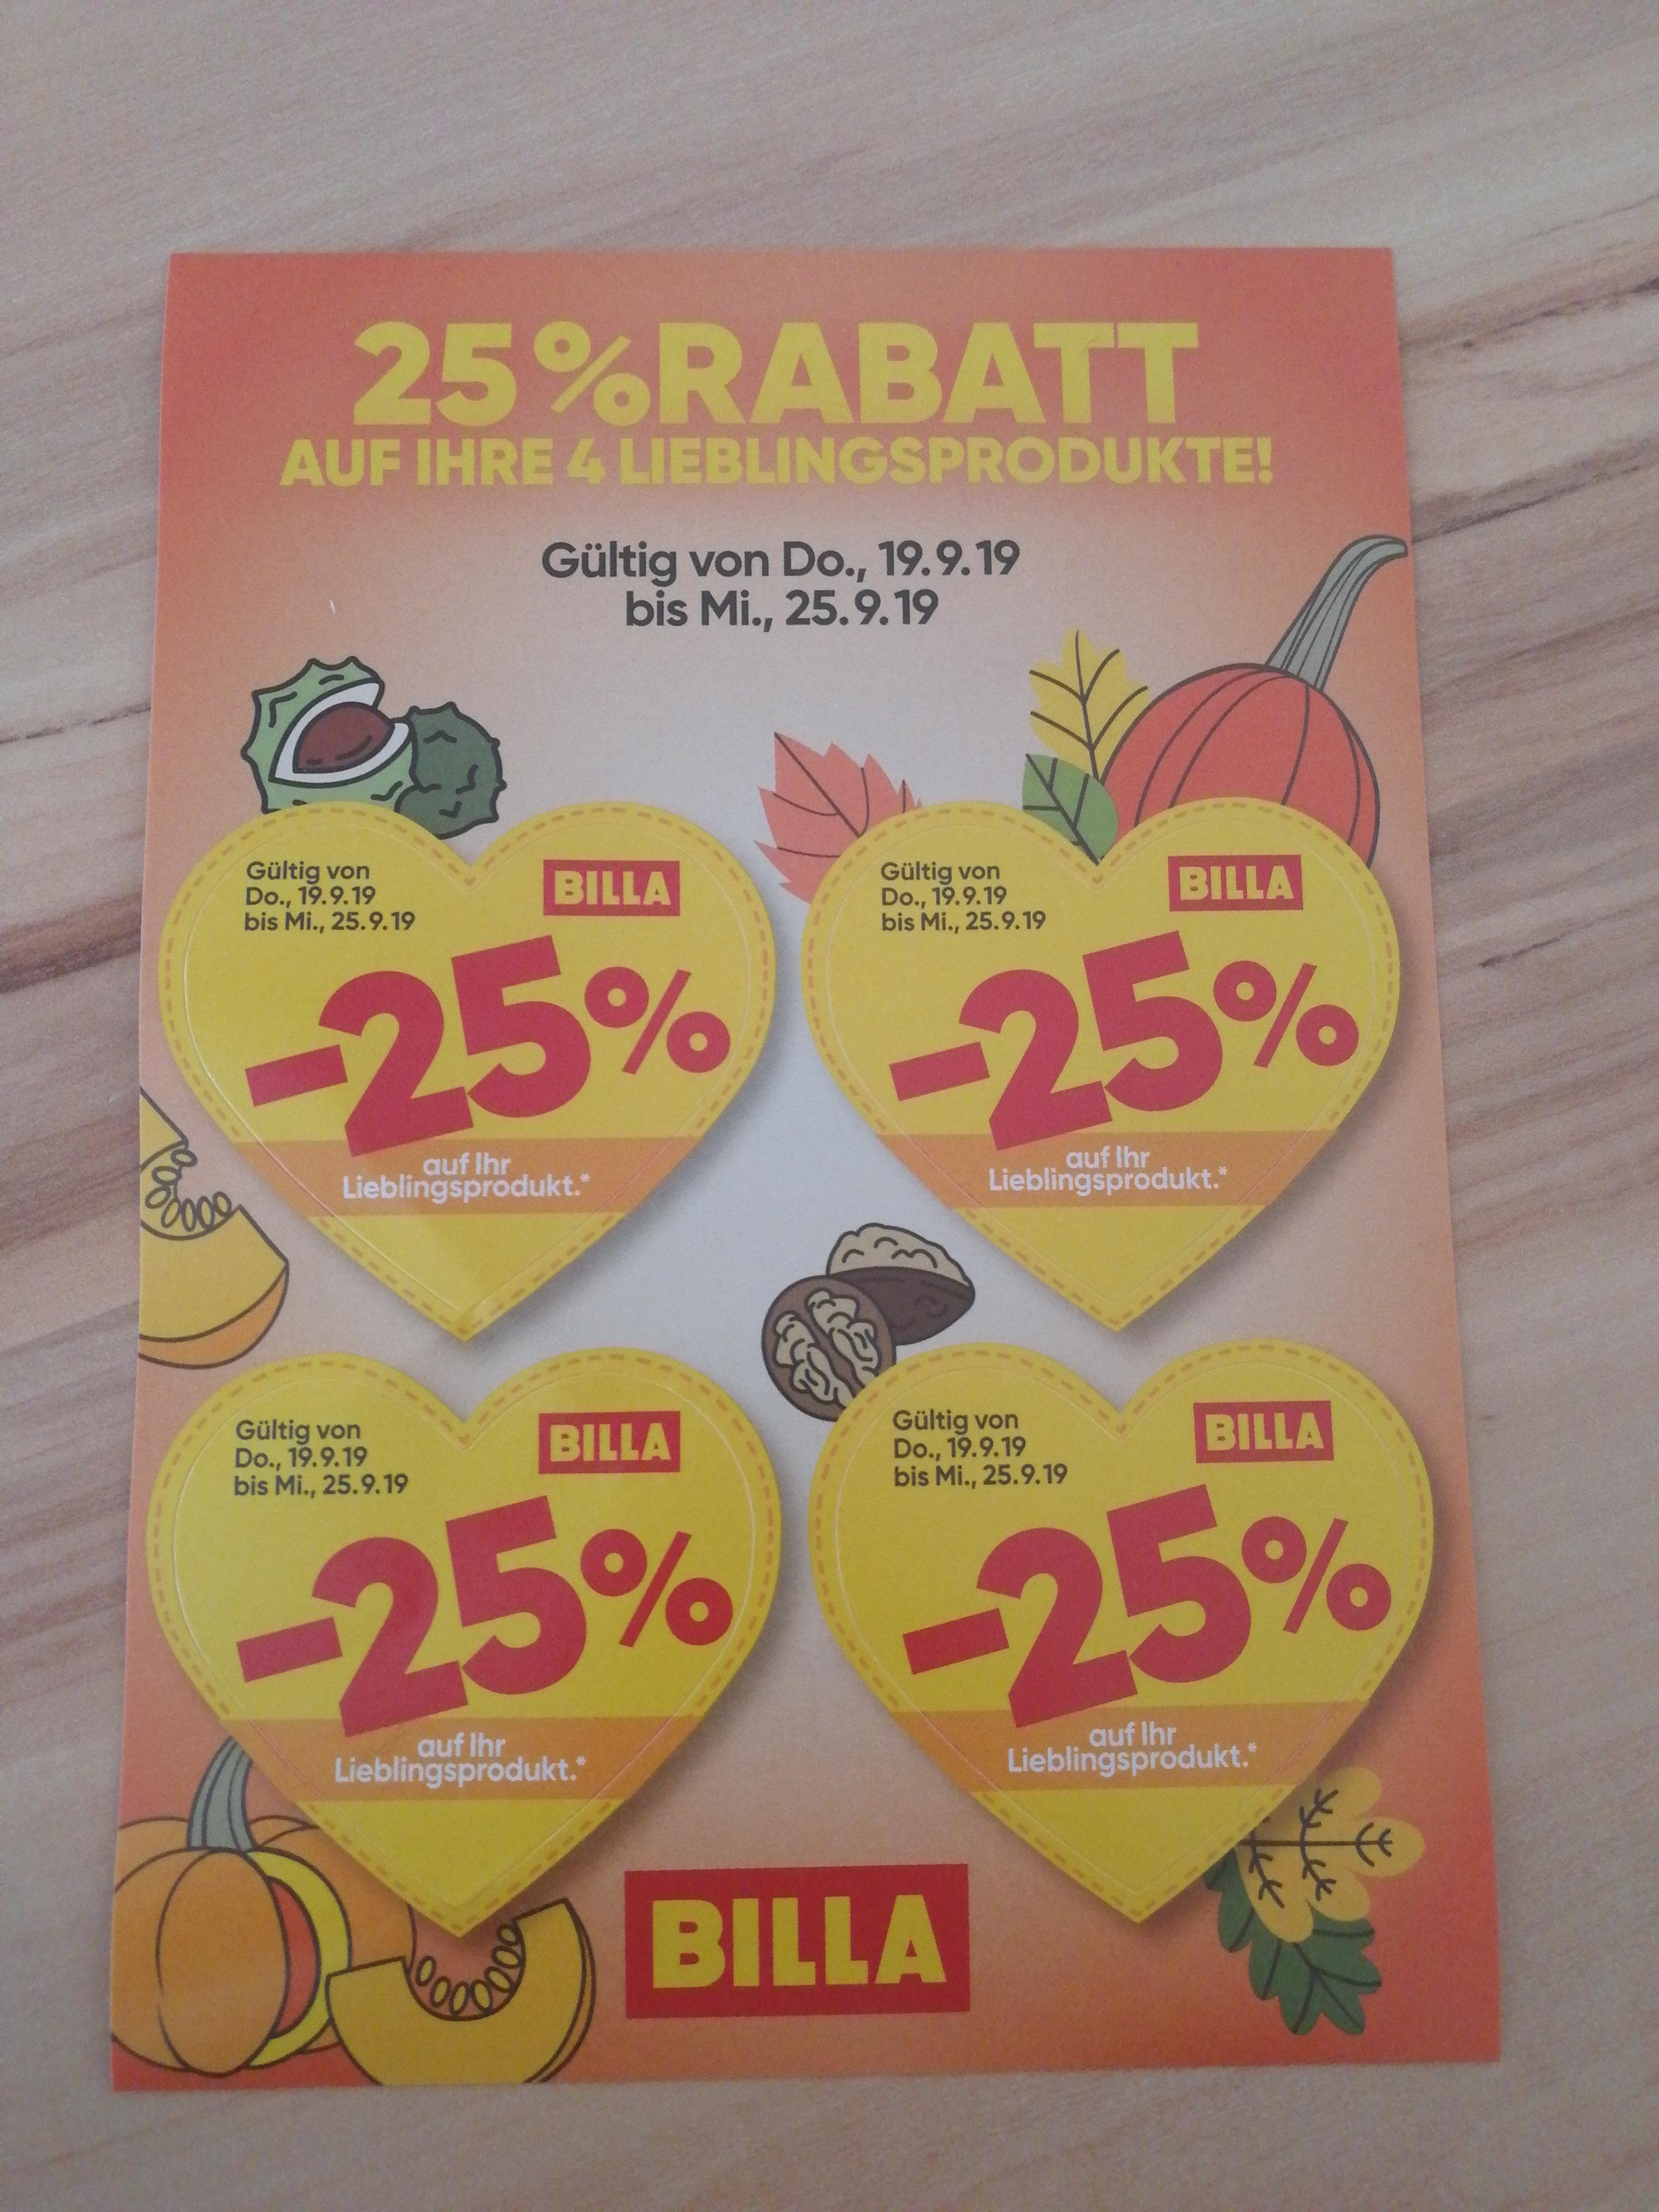 Billa 25 Prozent Rabatt Stickers im neuen Flugblatt